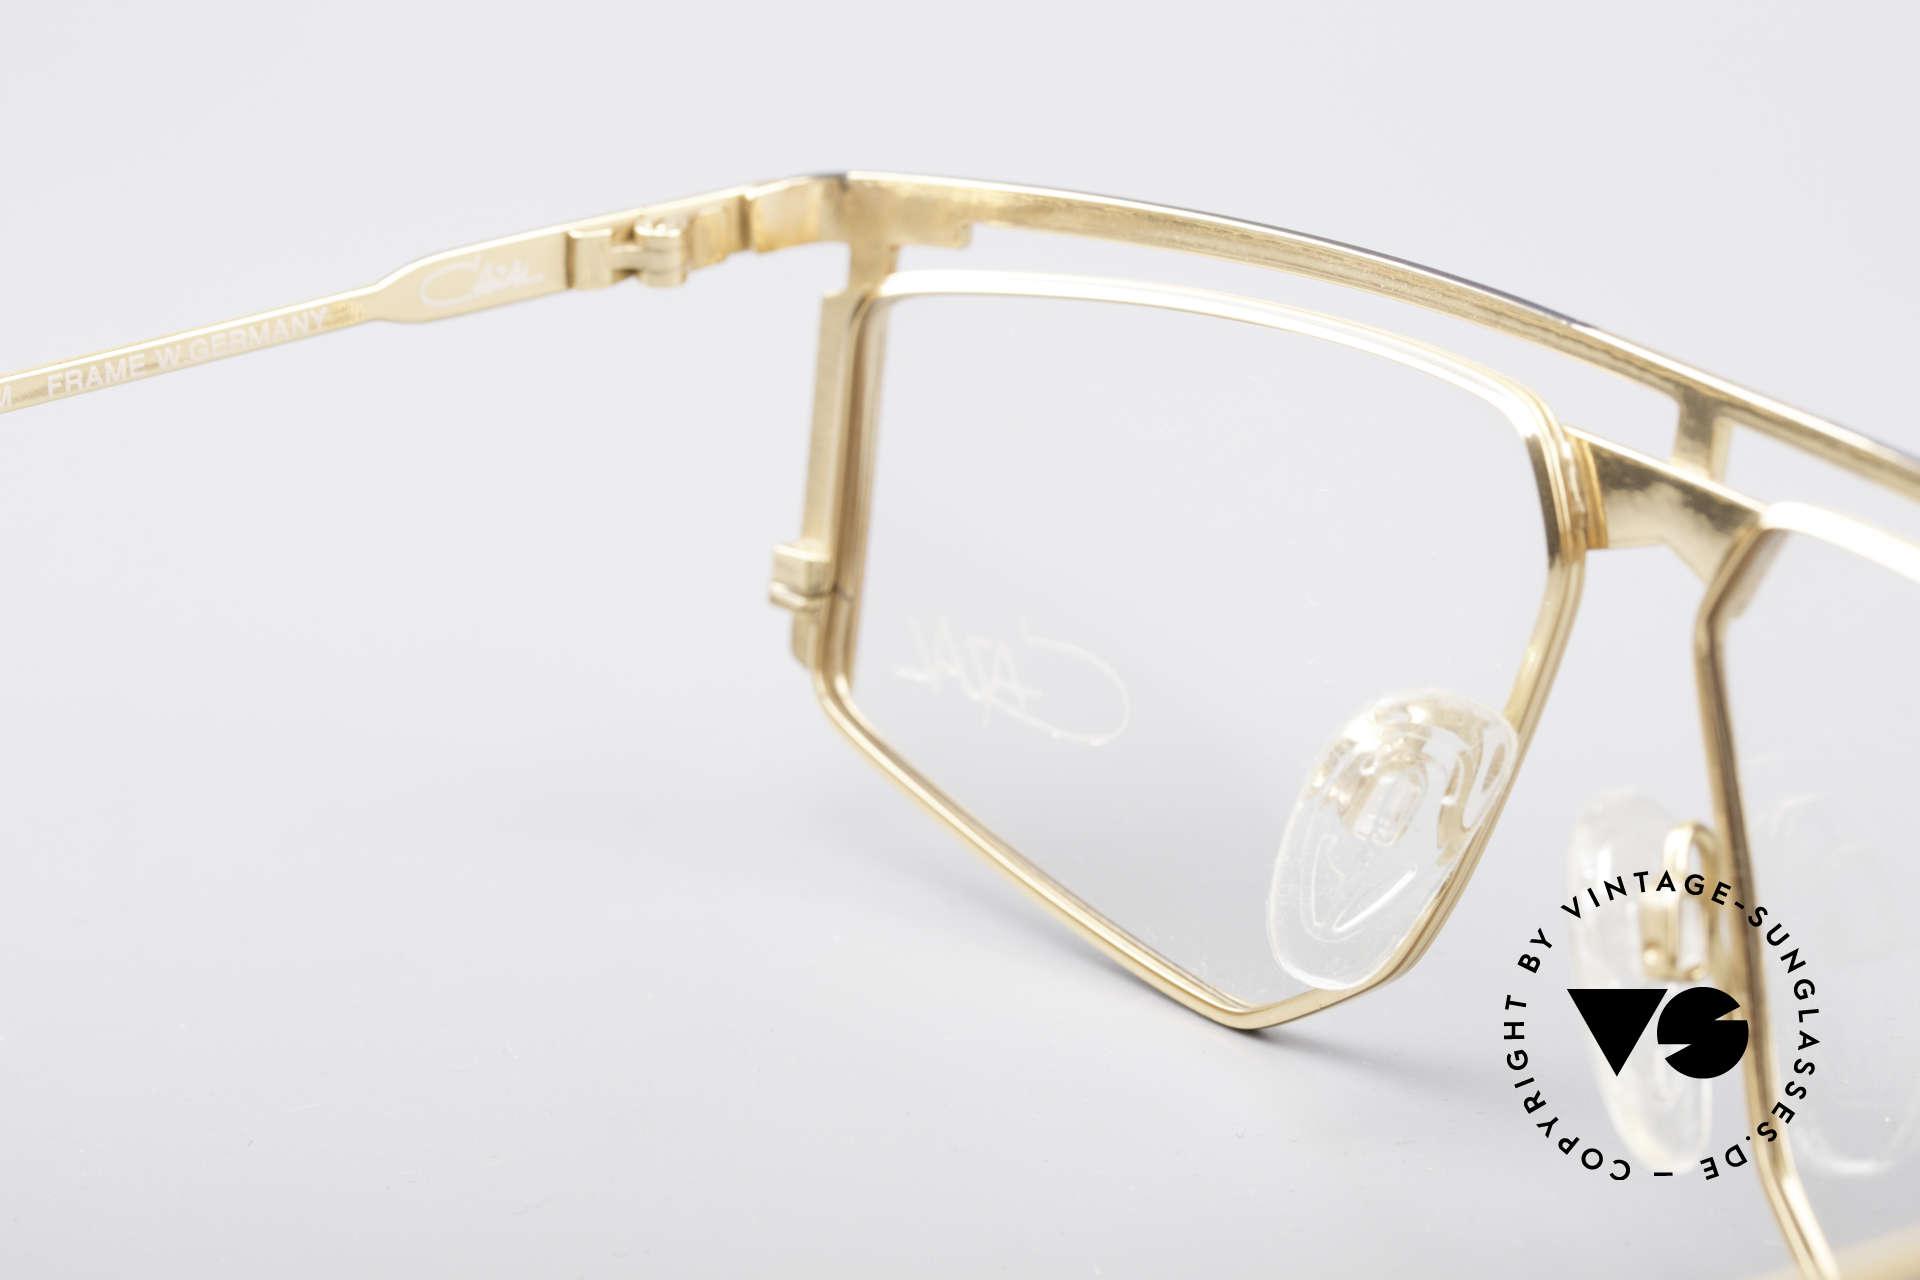 Cazal 235 Titanium Vintage Frame, the frame fits optical lenses or tinted lenses optionally, Made for Men and Women